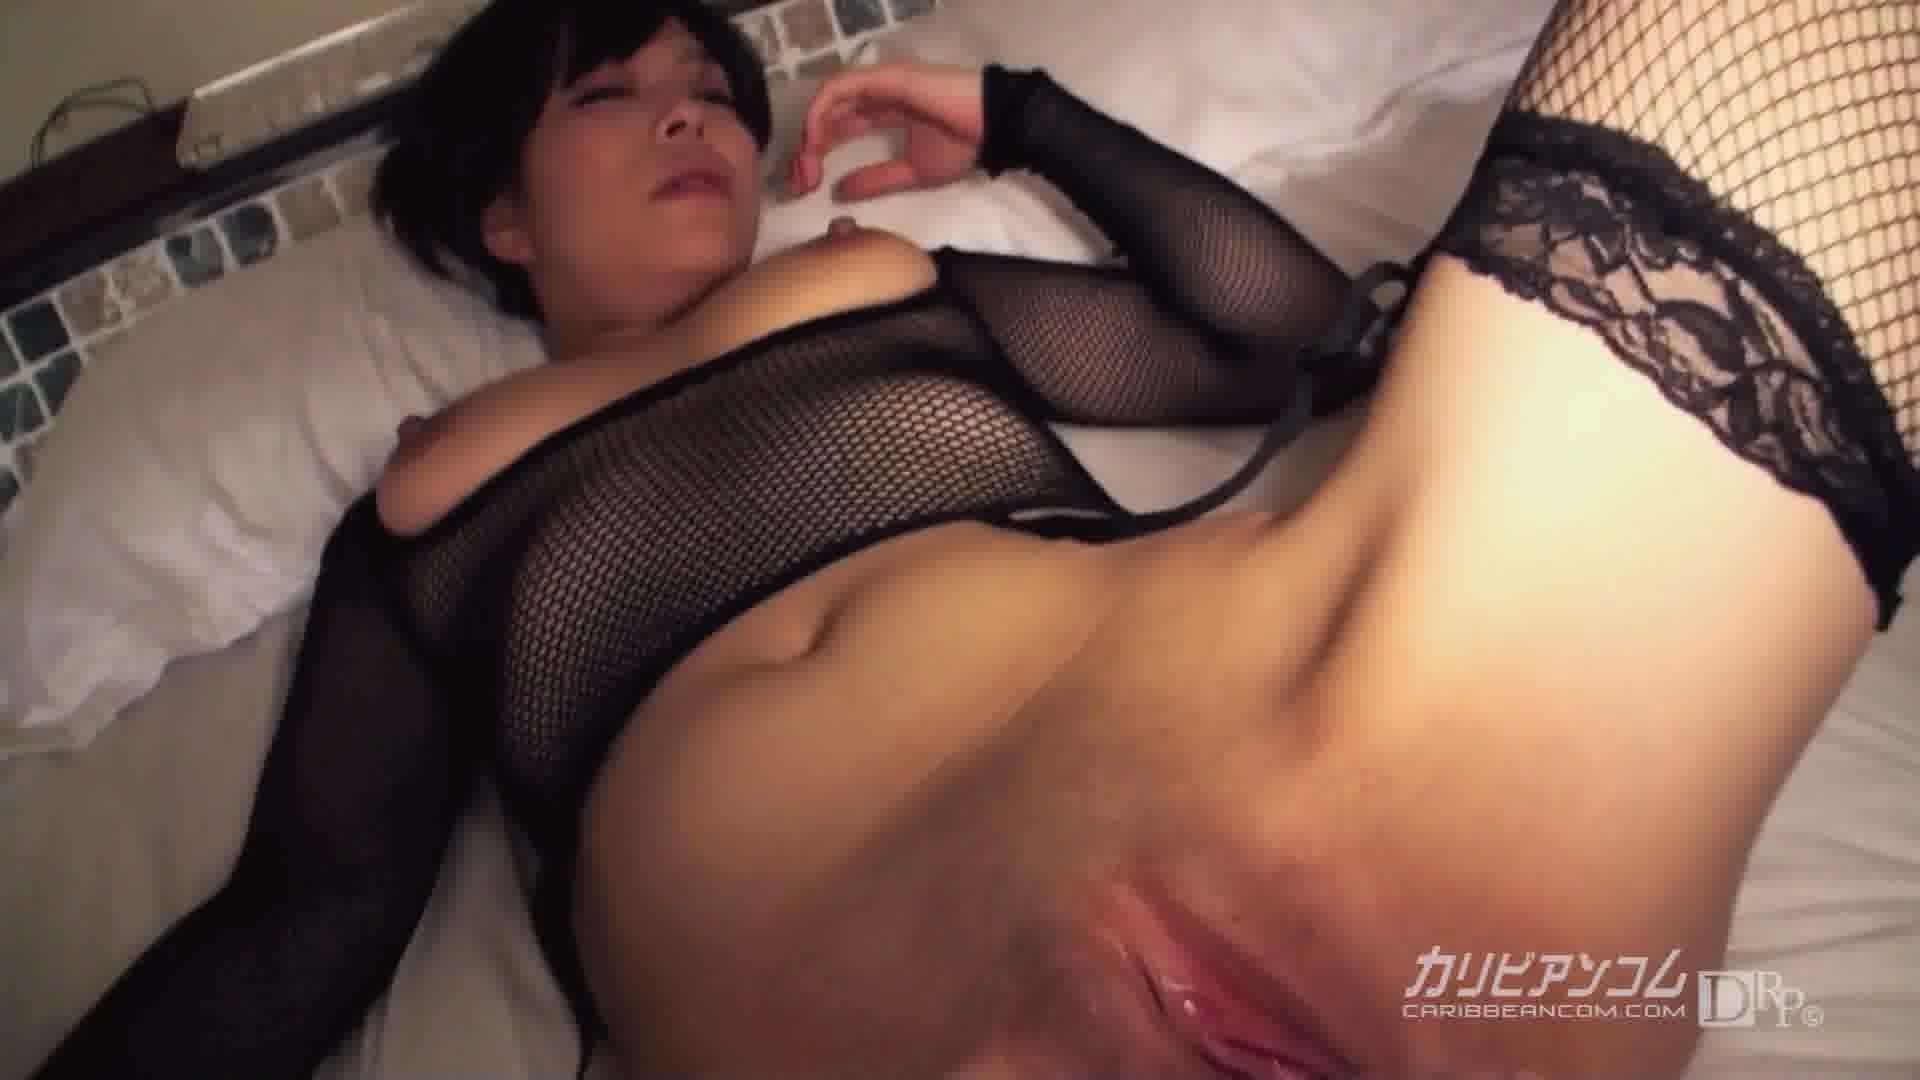 AV女優と飲み…そして泊まりSEX by HAMAR 5 後編 - 亜佐倉みんと【巨乳・パイパン・中出し】